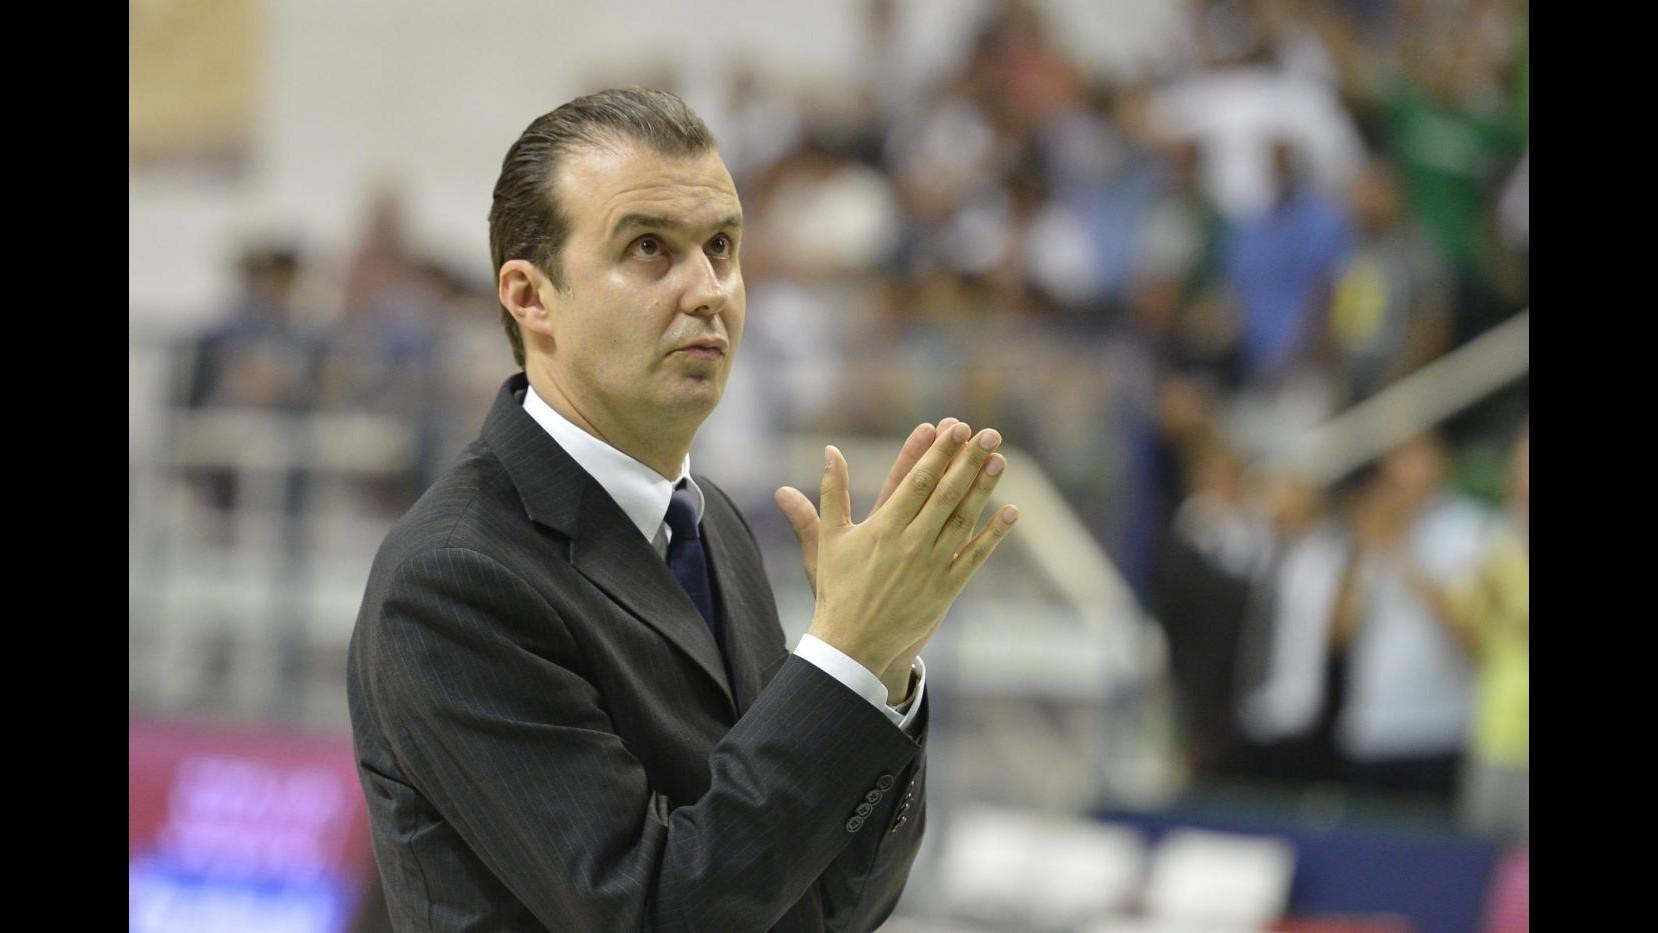 Basket, Italia-Bielorussia 83-58: azzurri chiudono girone imbattuti